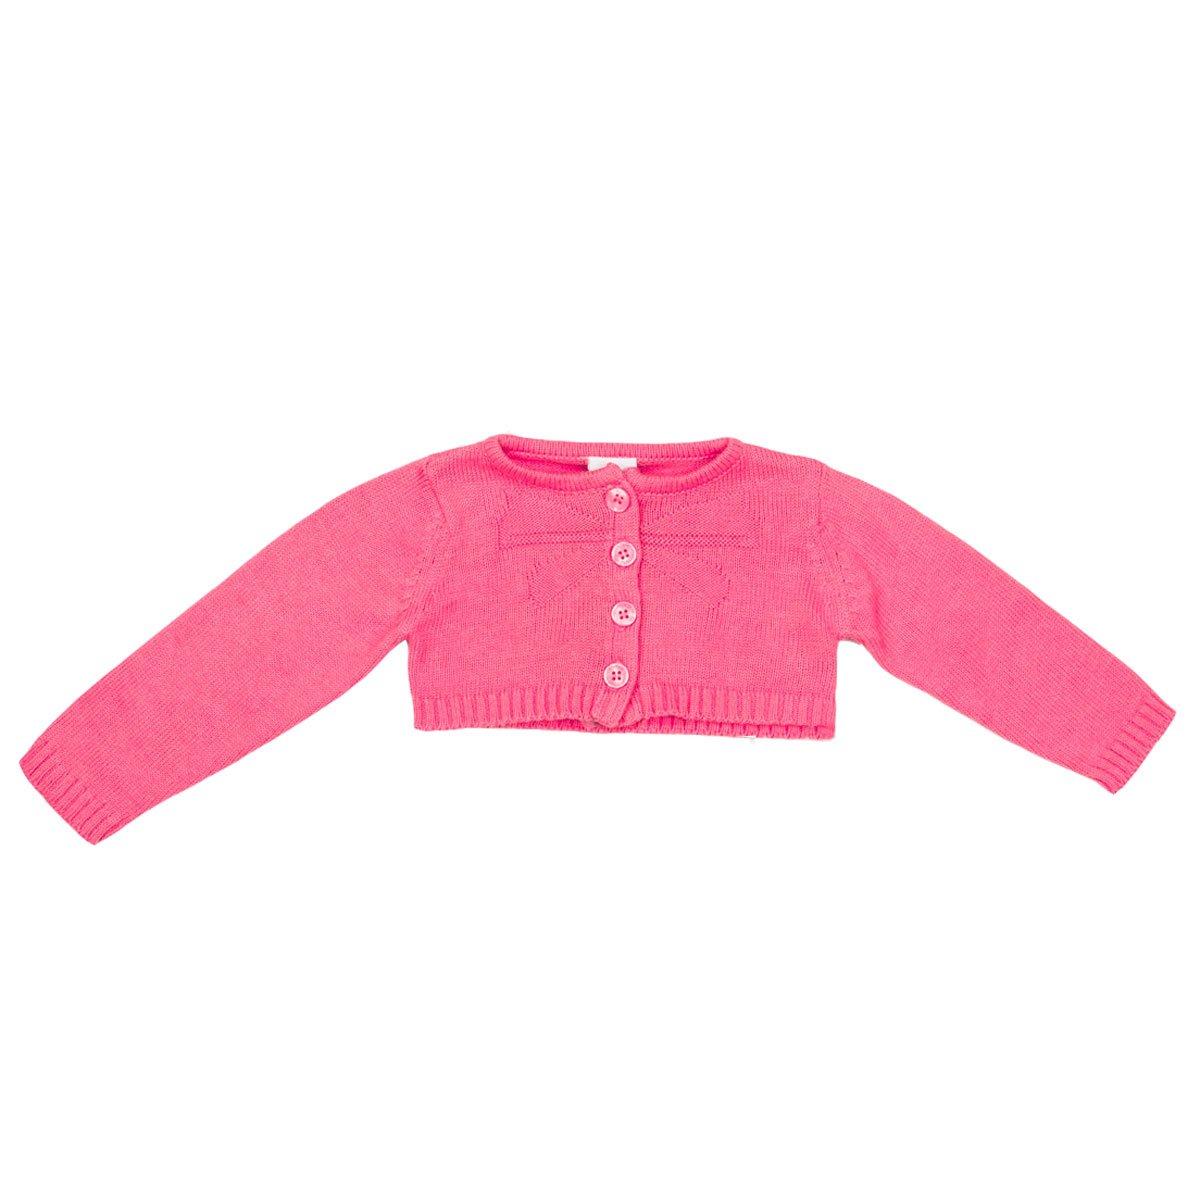 a720739add Bizz Store - Bolero Infantil Bebê Menina Tip Top Tricot